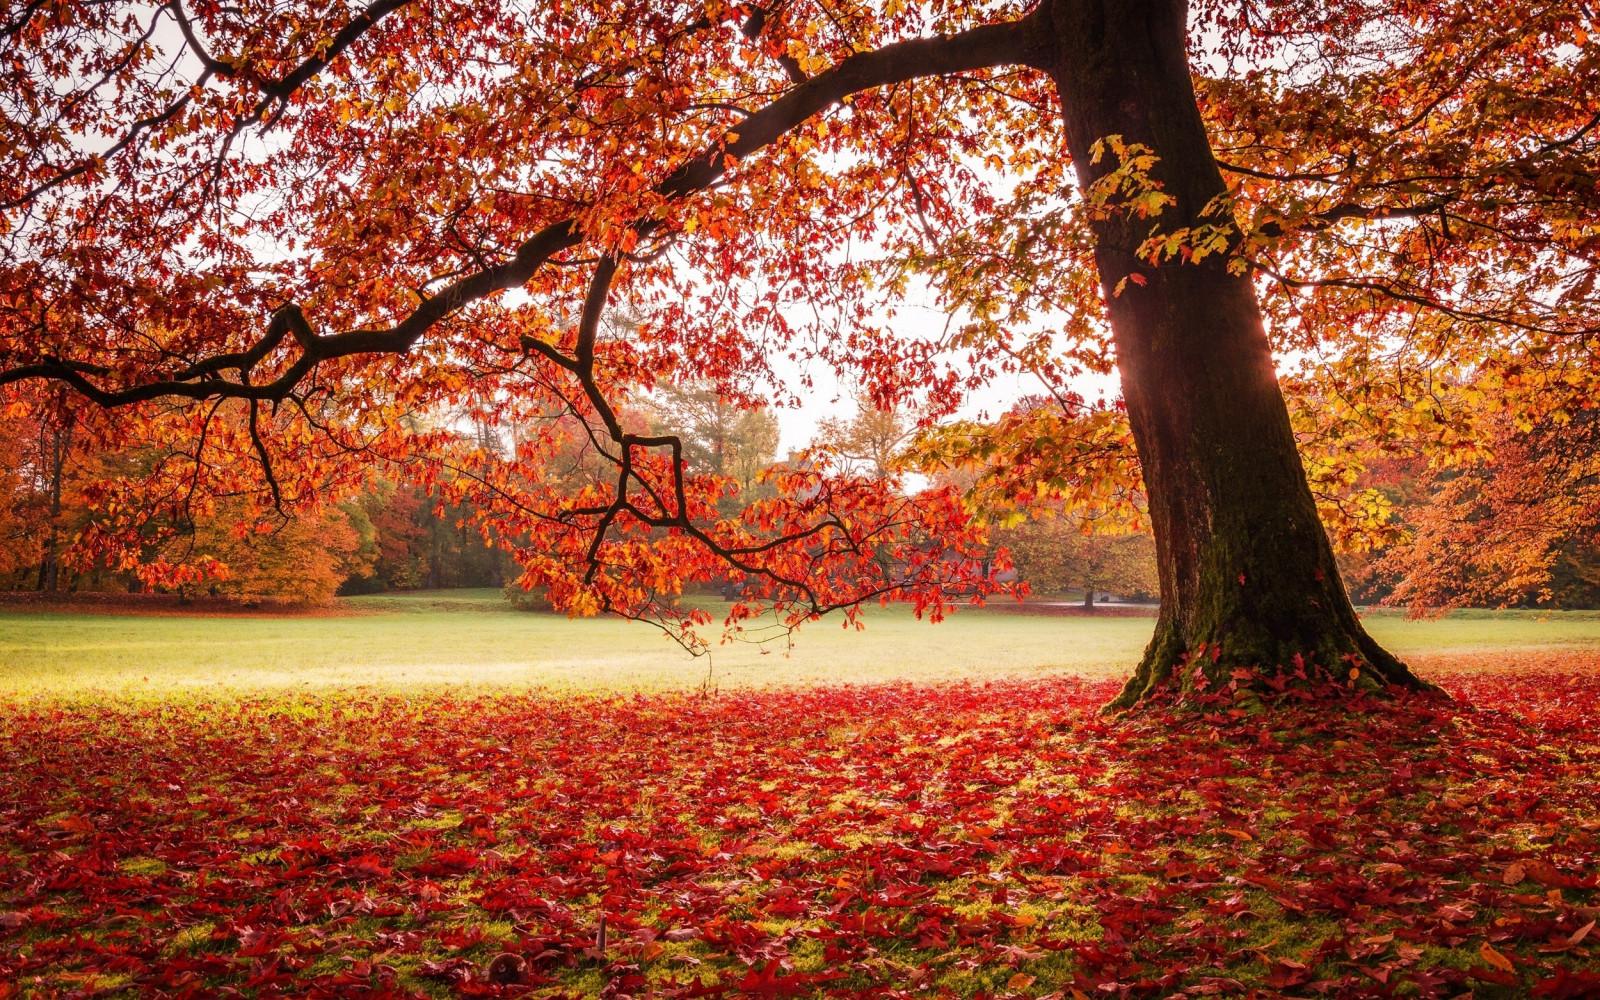 Fall Season Desktop Wallpaper Wallpaper Sunlight Trees Landscape Fall Leaves